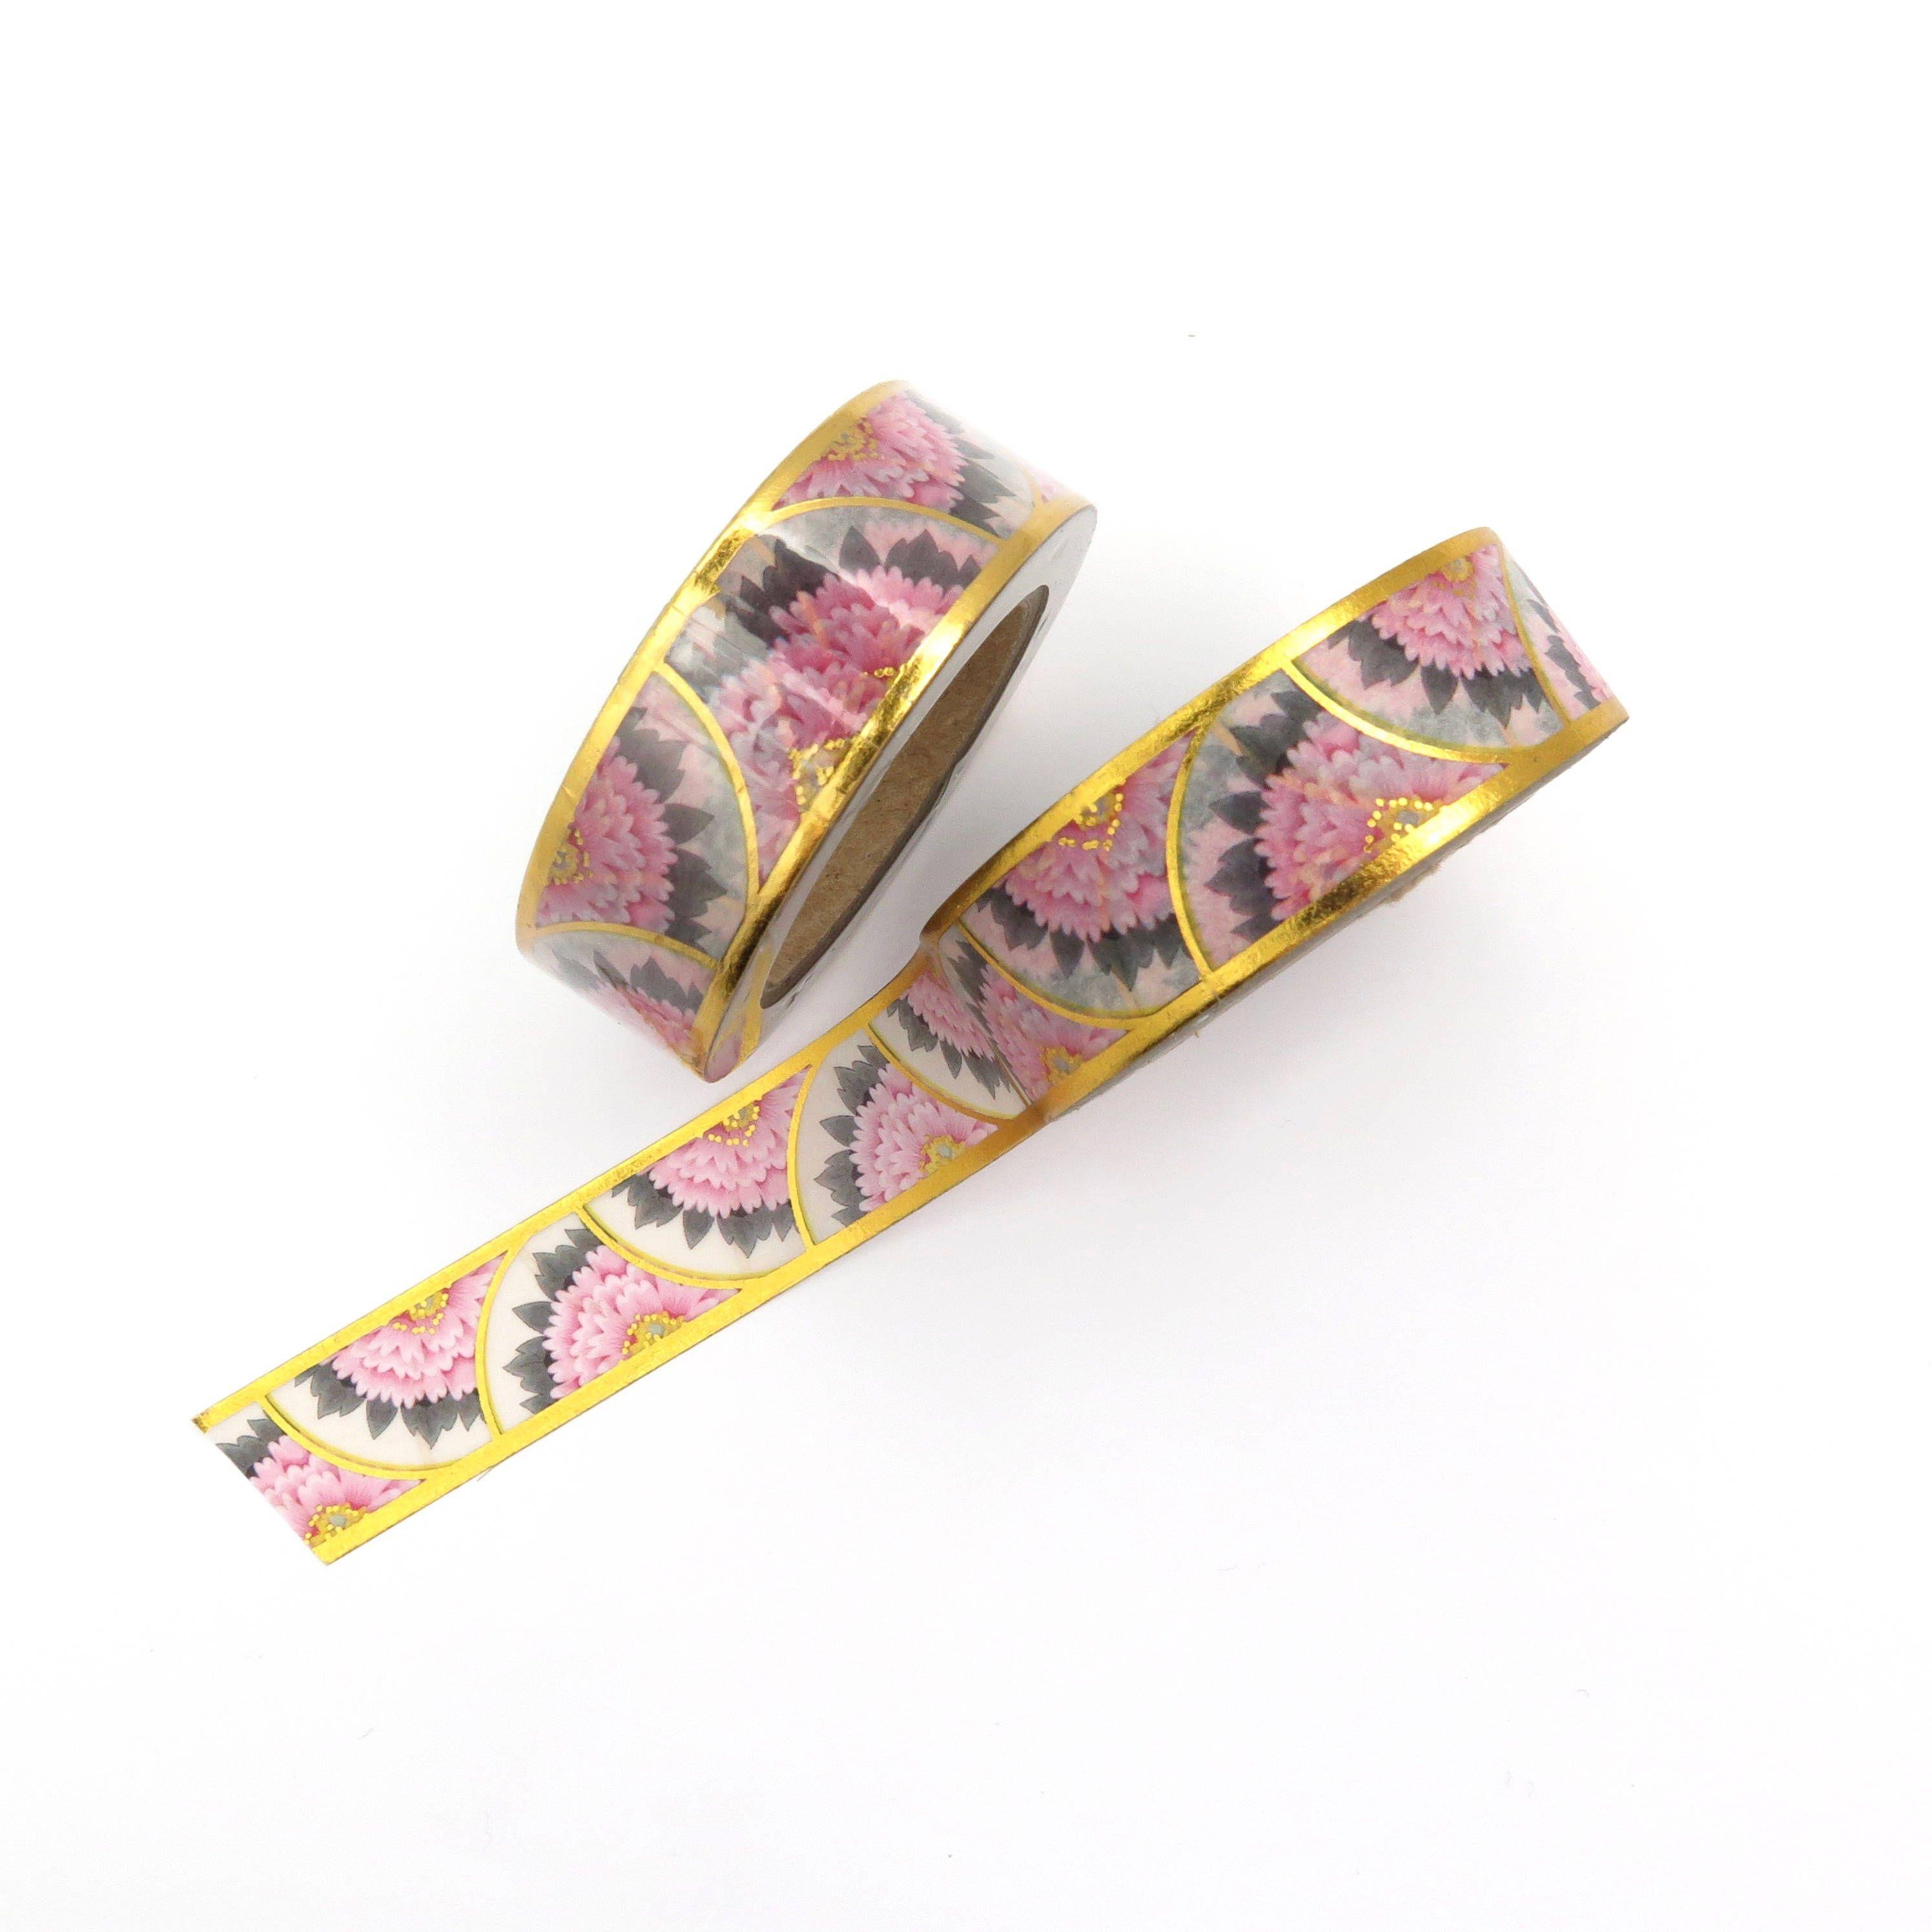 Washi Tape Art Deco Scrapbooking Tape Craft Tape Gold Foil